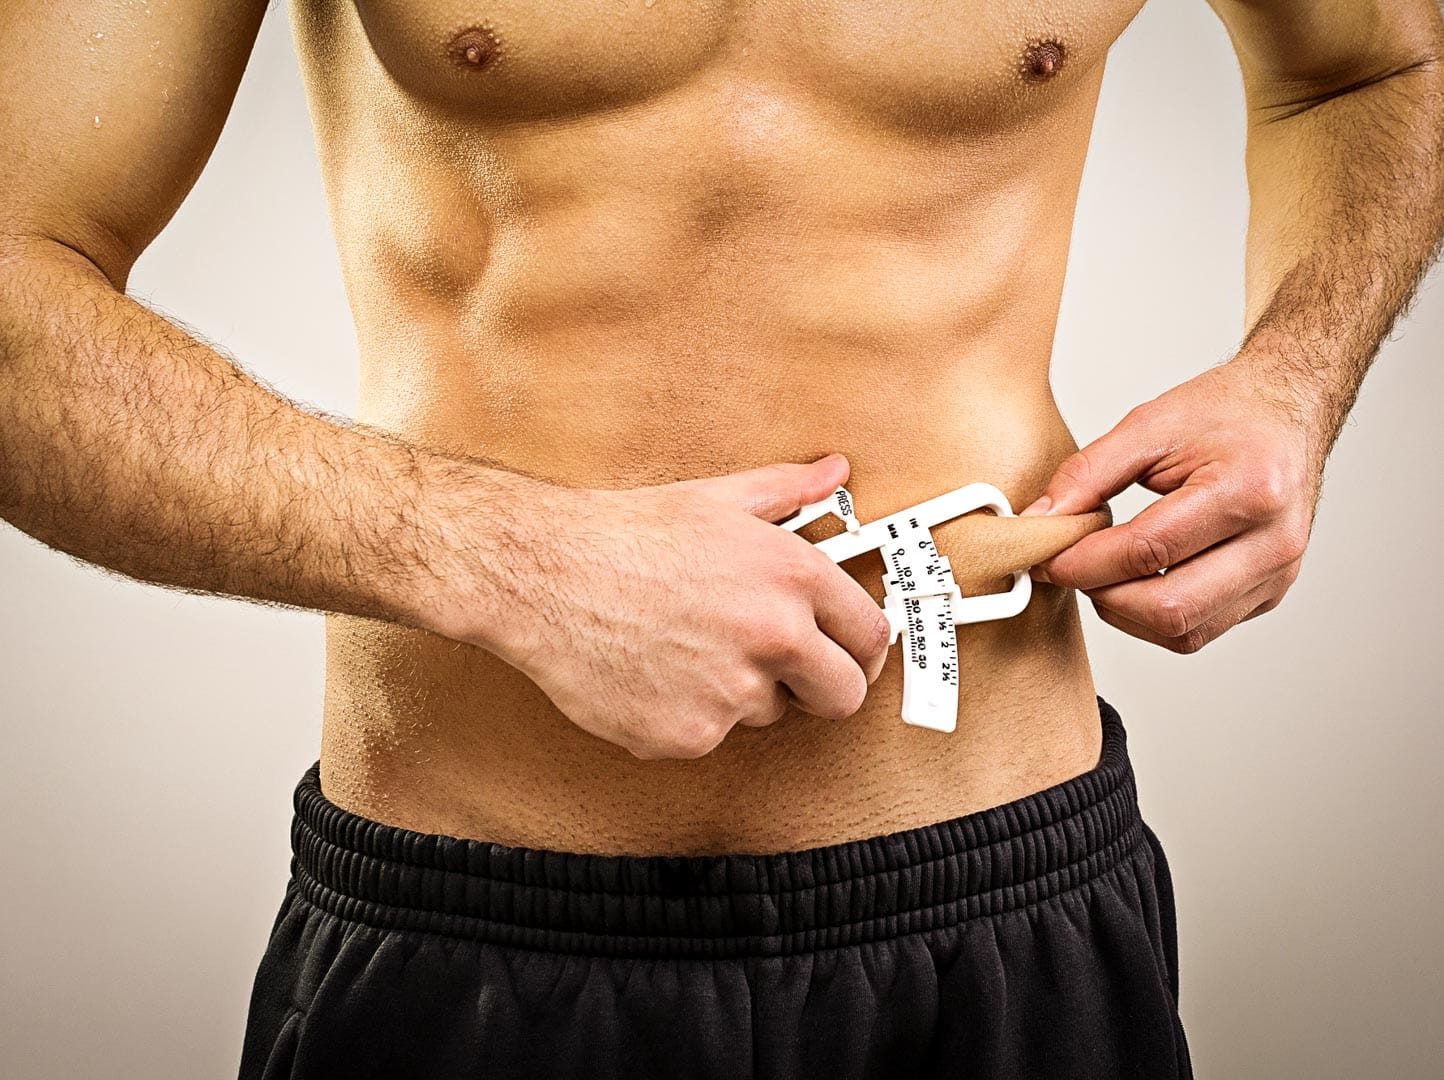 body fat percentage measurement